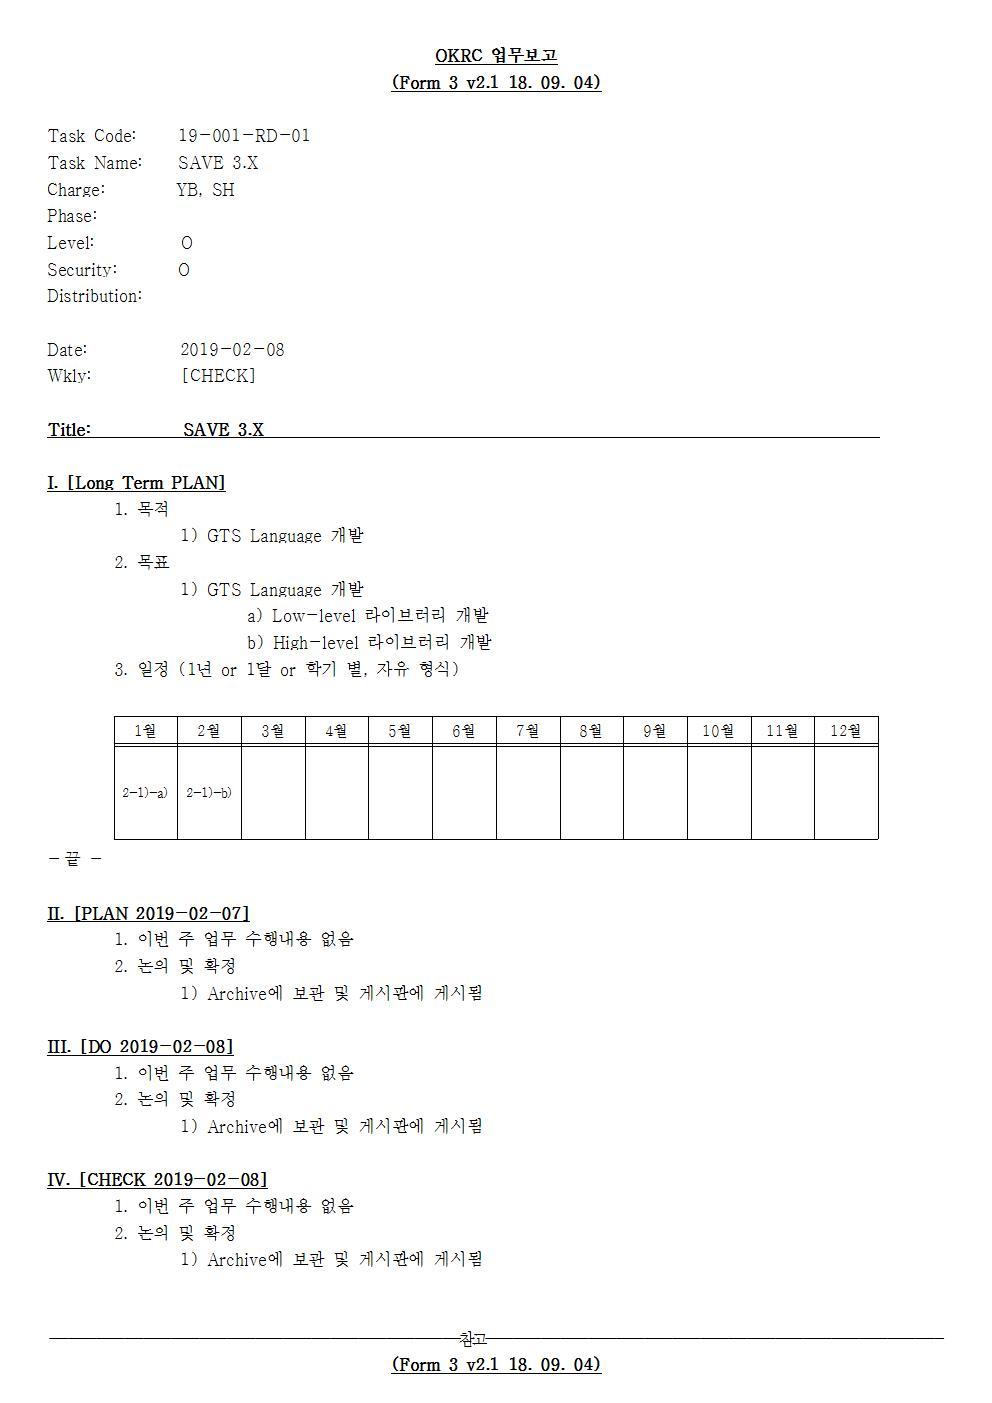 D-[19-001-RD-01]-[SAVE 3.X]-[2019-02-08][SH]001.jpg